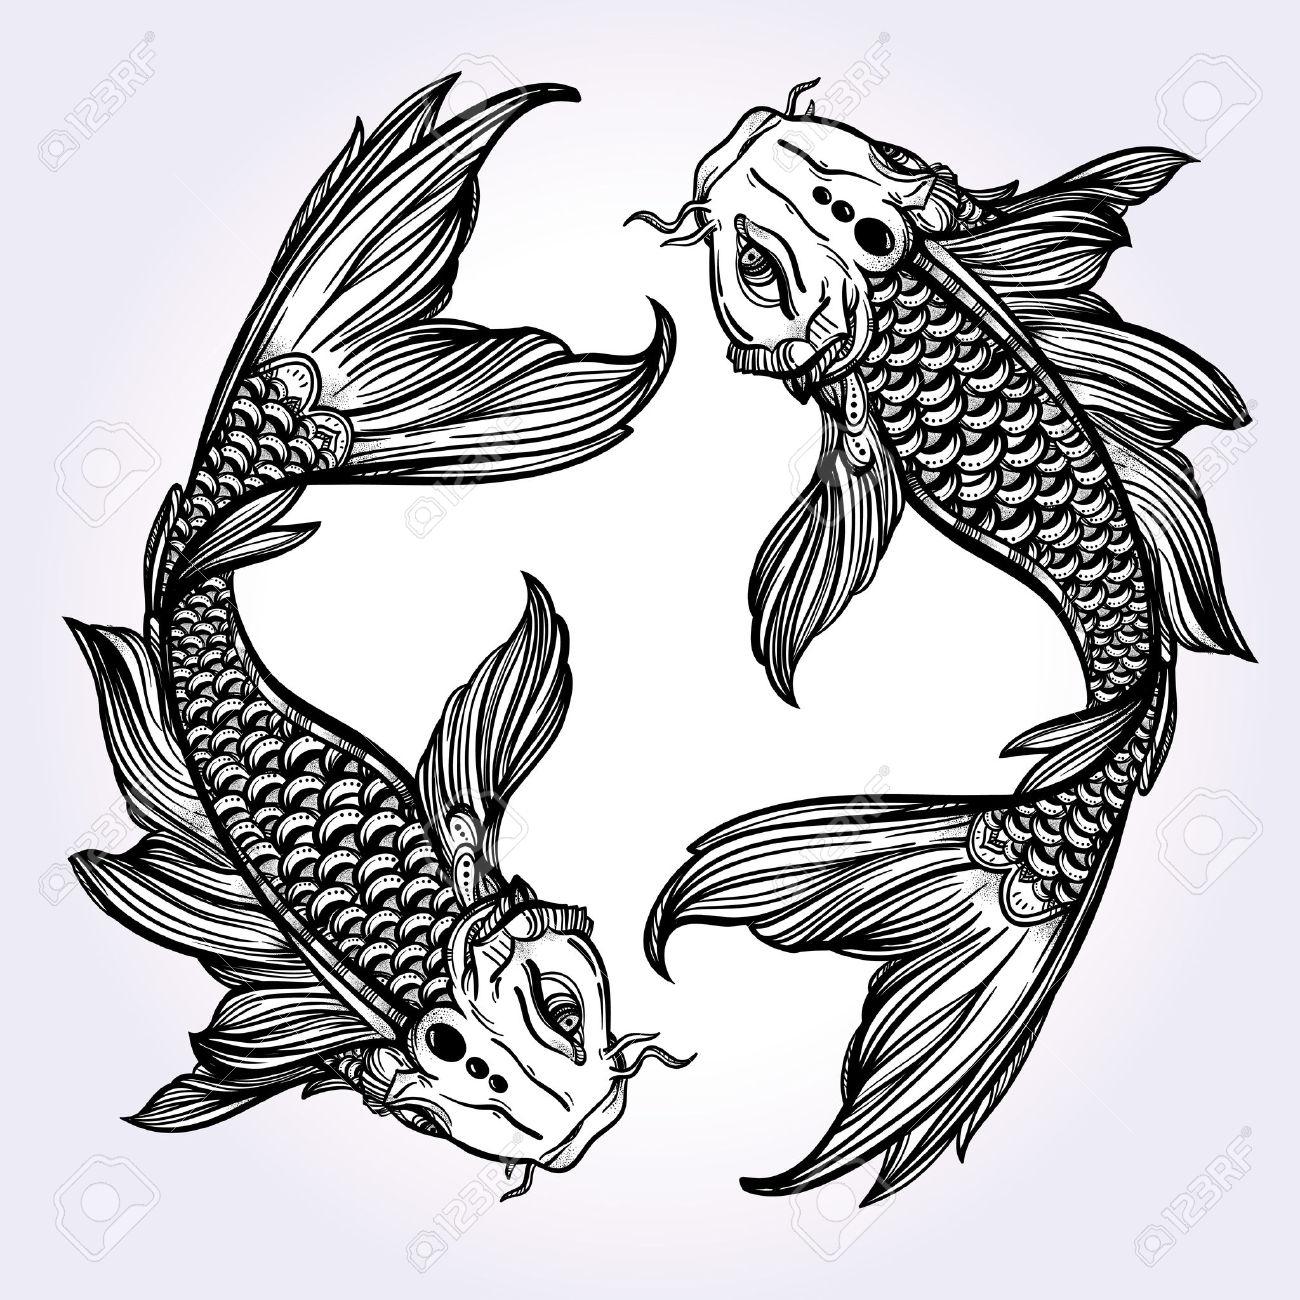 1300x1300 Black And White Koi Fish Drawings